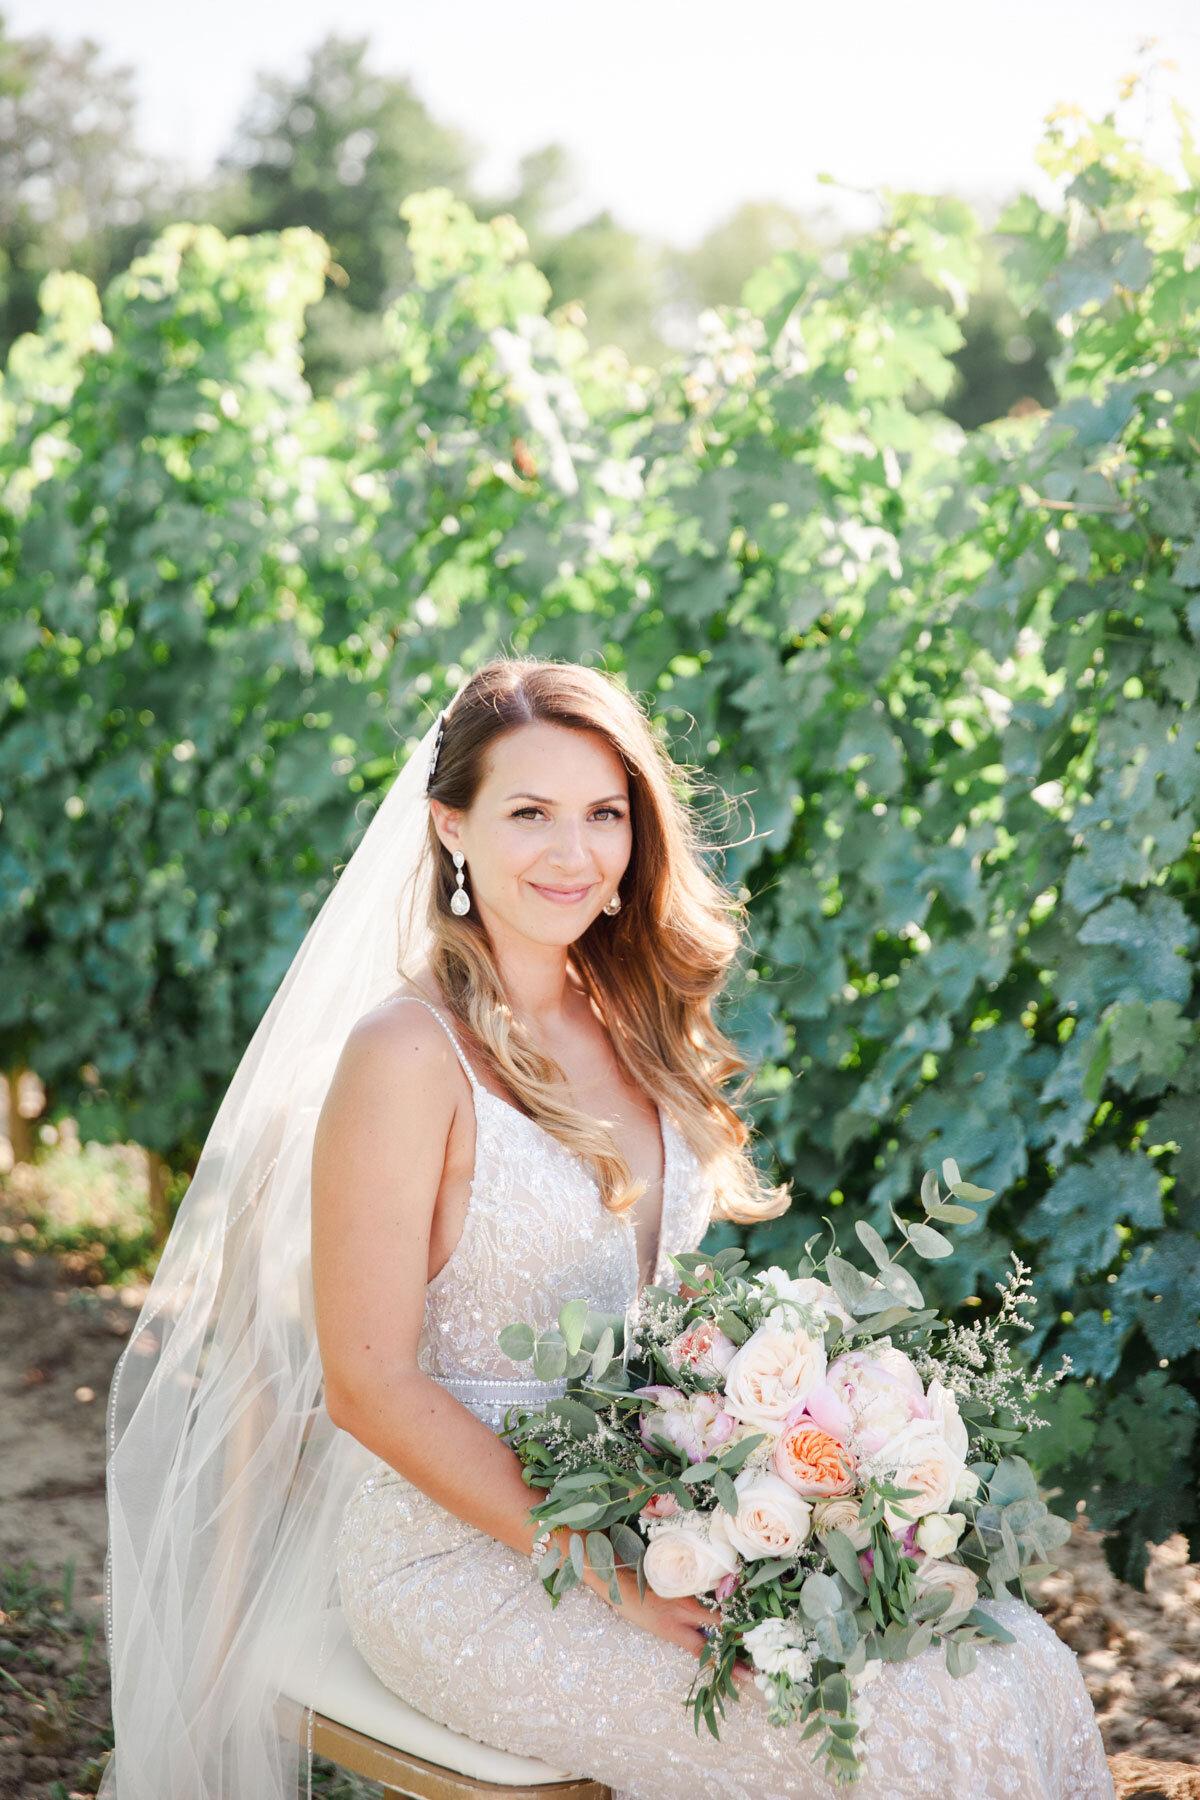 Chateau-des-Charmes-Wedding-Summer-Vineyard-Bride-Niagara-on-the-Lake-photos-by-Gemini-Photography-Ontario-0042.jpg